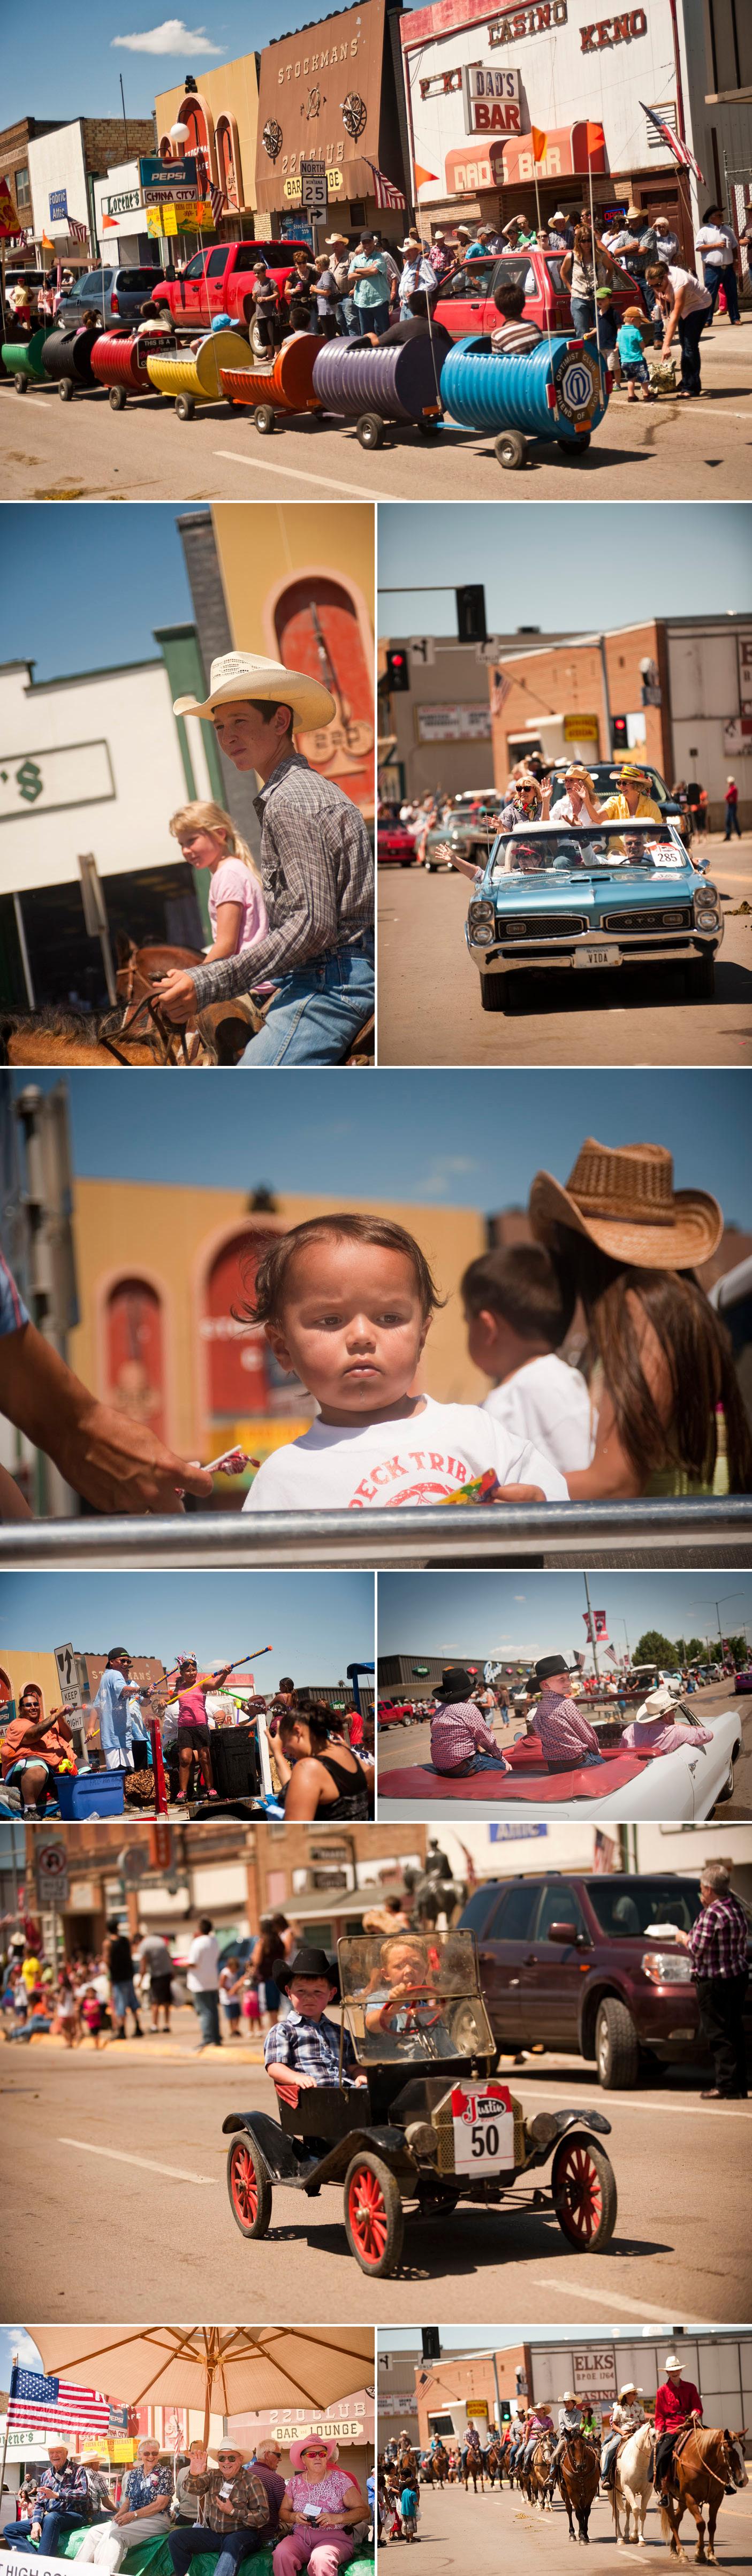 Stampede Collage #2EAB